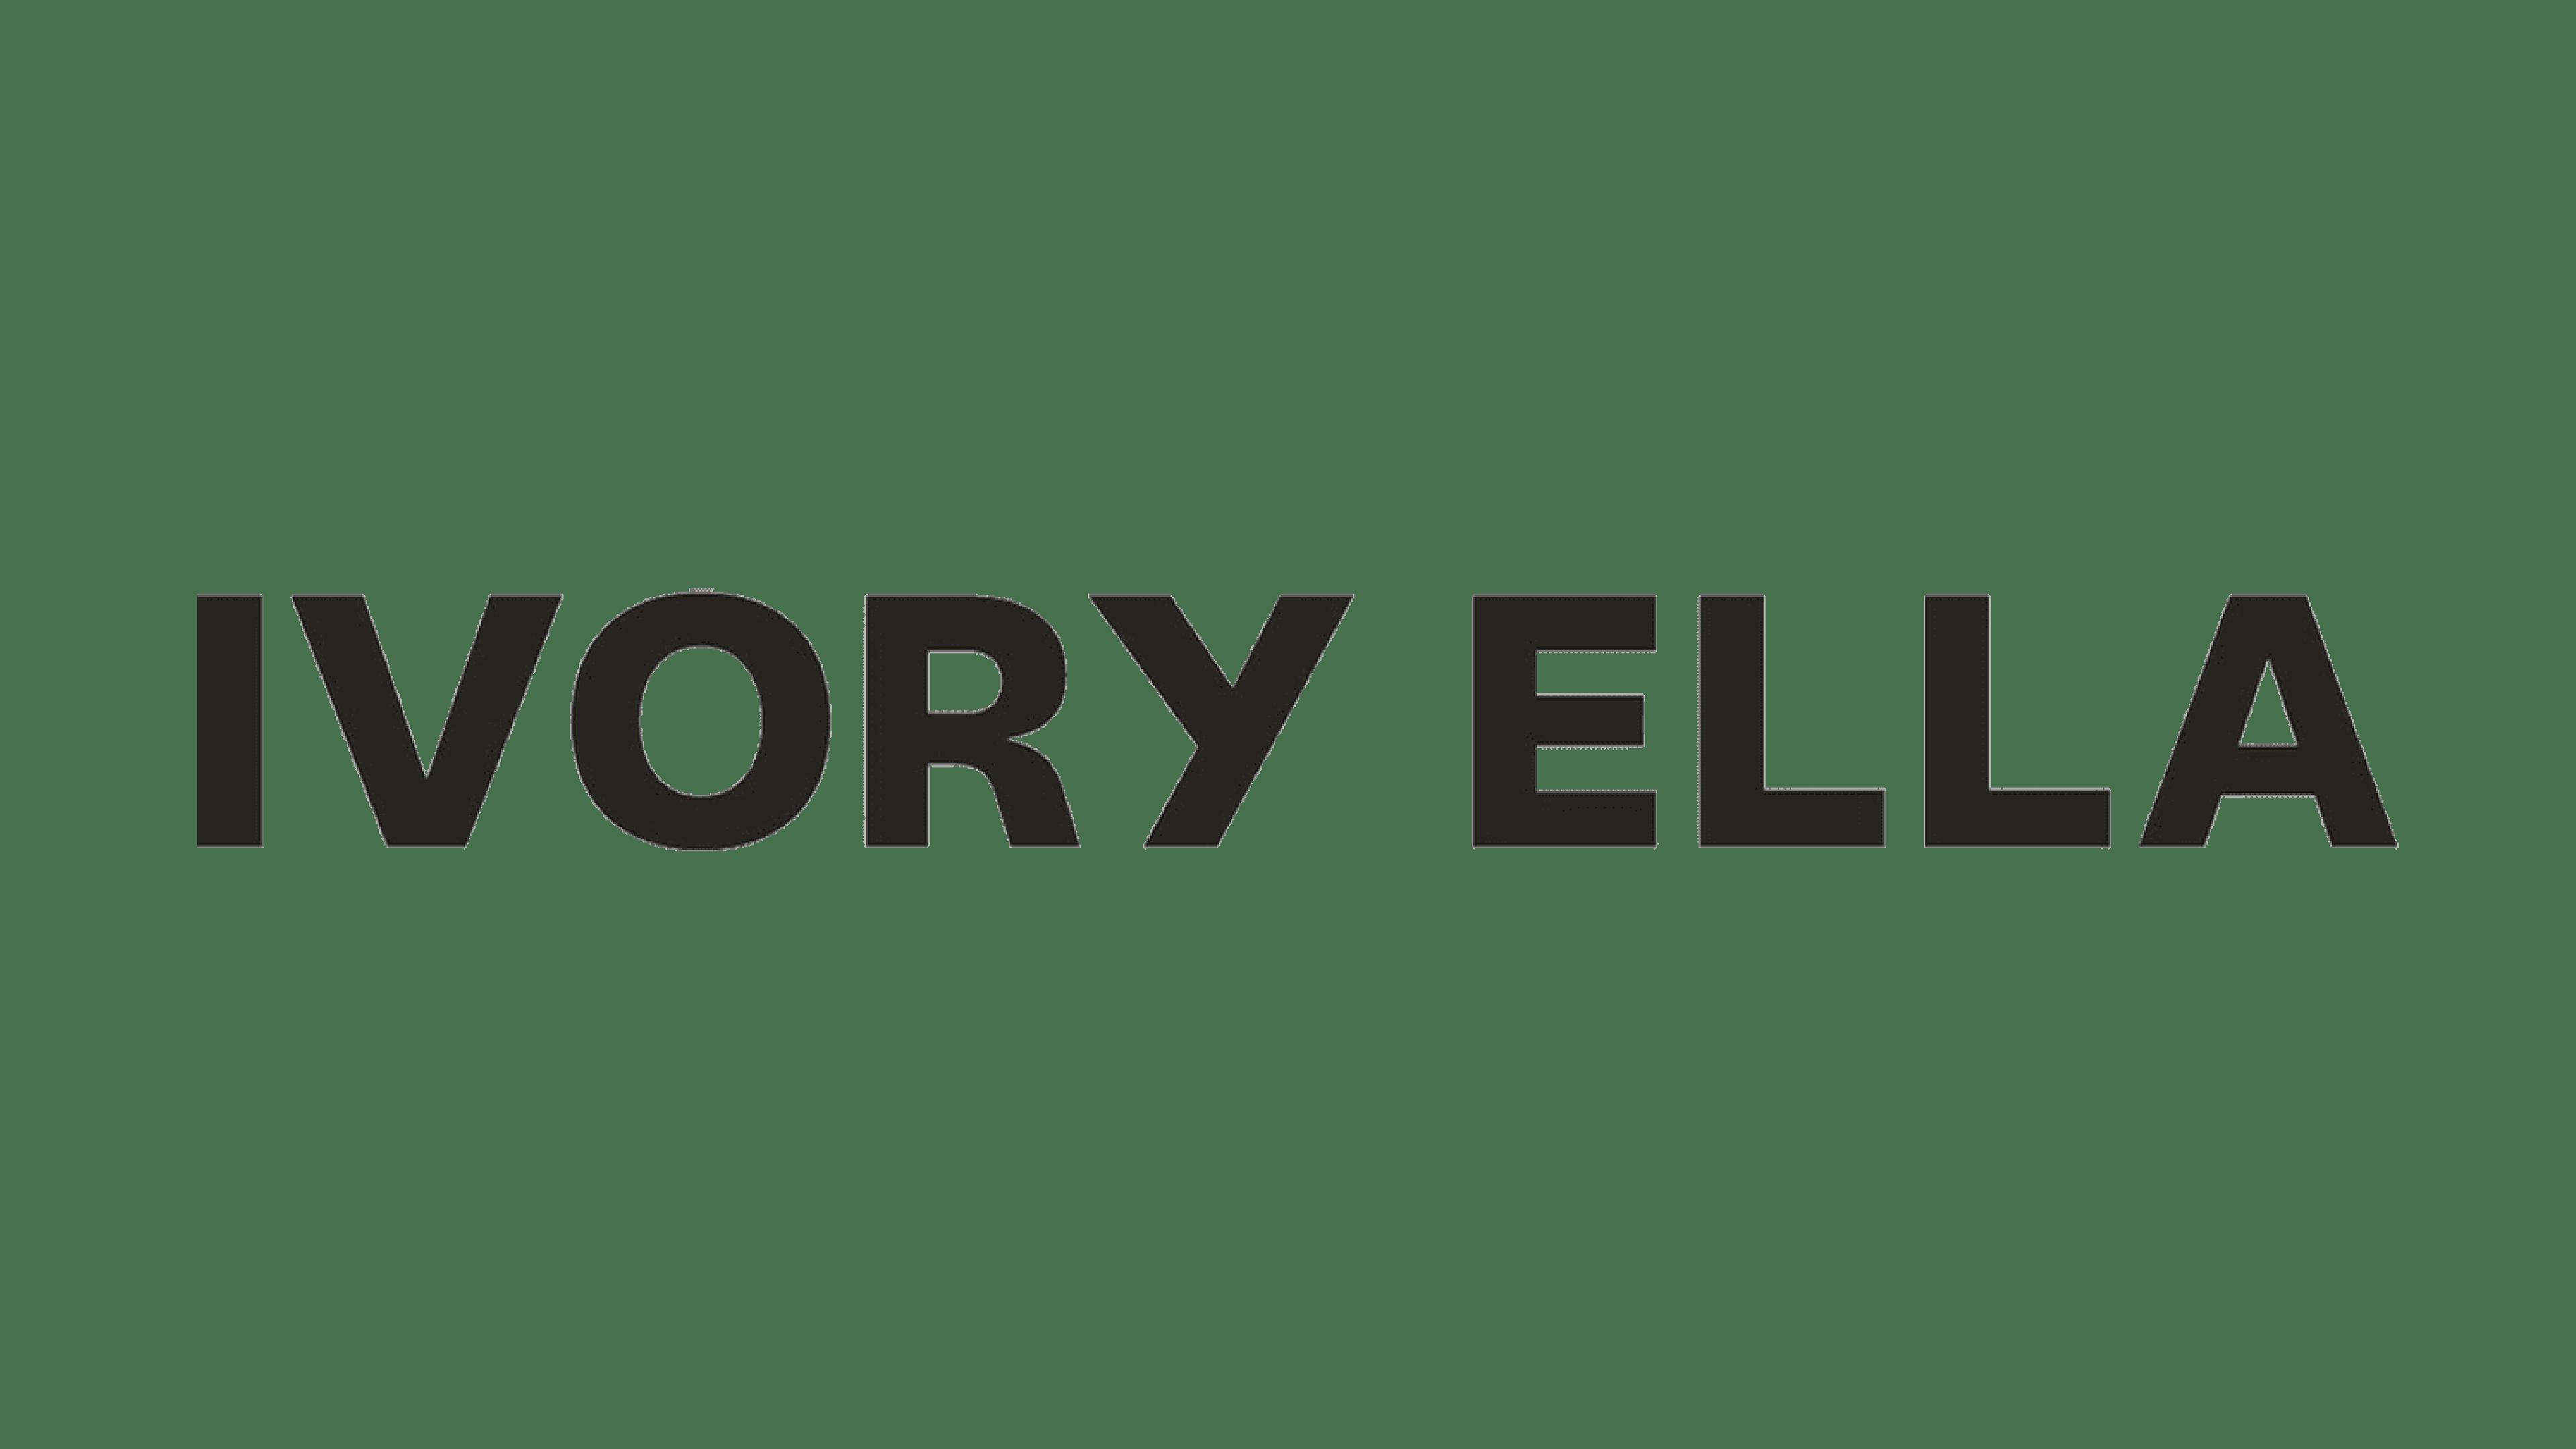 IVORY ELLA